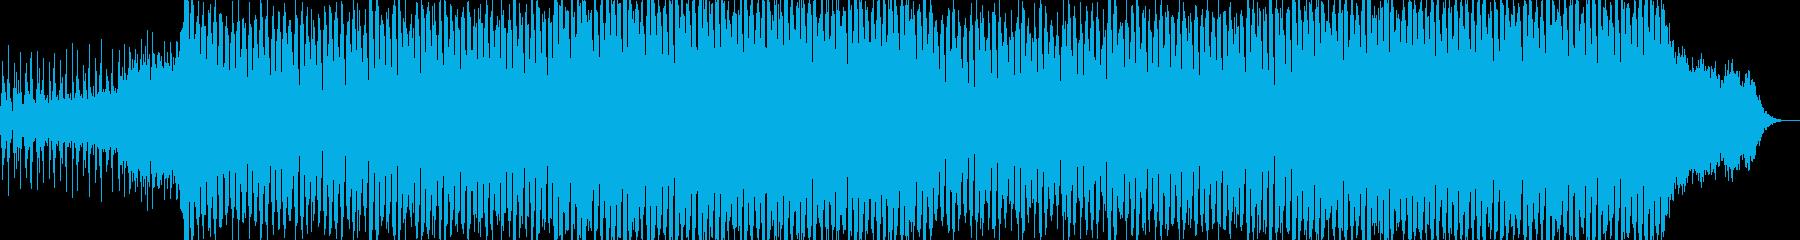 EDMポップで明るいクラブ系-114の再生済みの波形